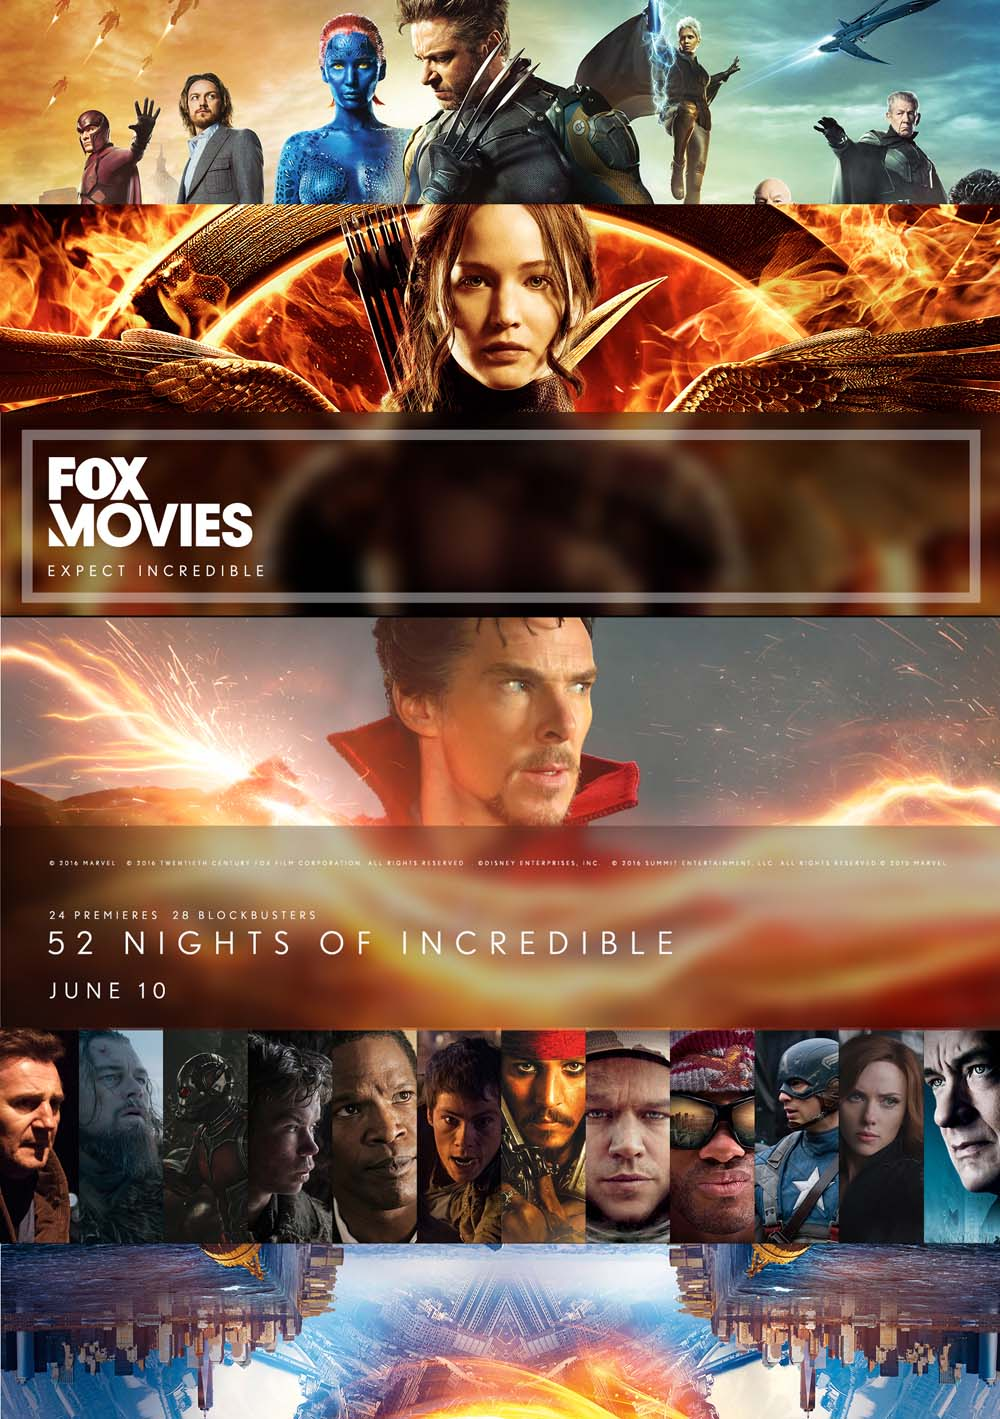 <a  style='text-decoration: none; font-weight:bold;' href=http://www.redwhitecommunication.com:80/index.php/_home/news/id/MTIz.php>Lakukan Perubahan, Fox Movies Manjakan Pemirsa dengan 52 Film selama 52 Hari</a>